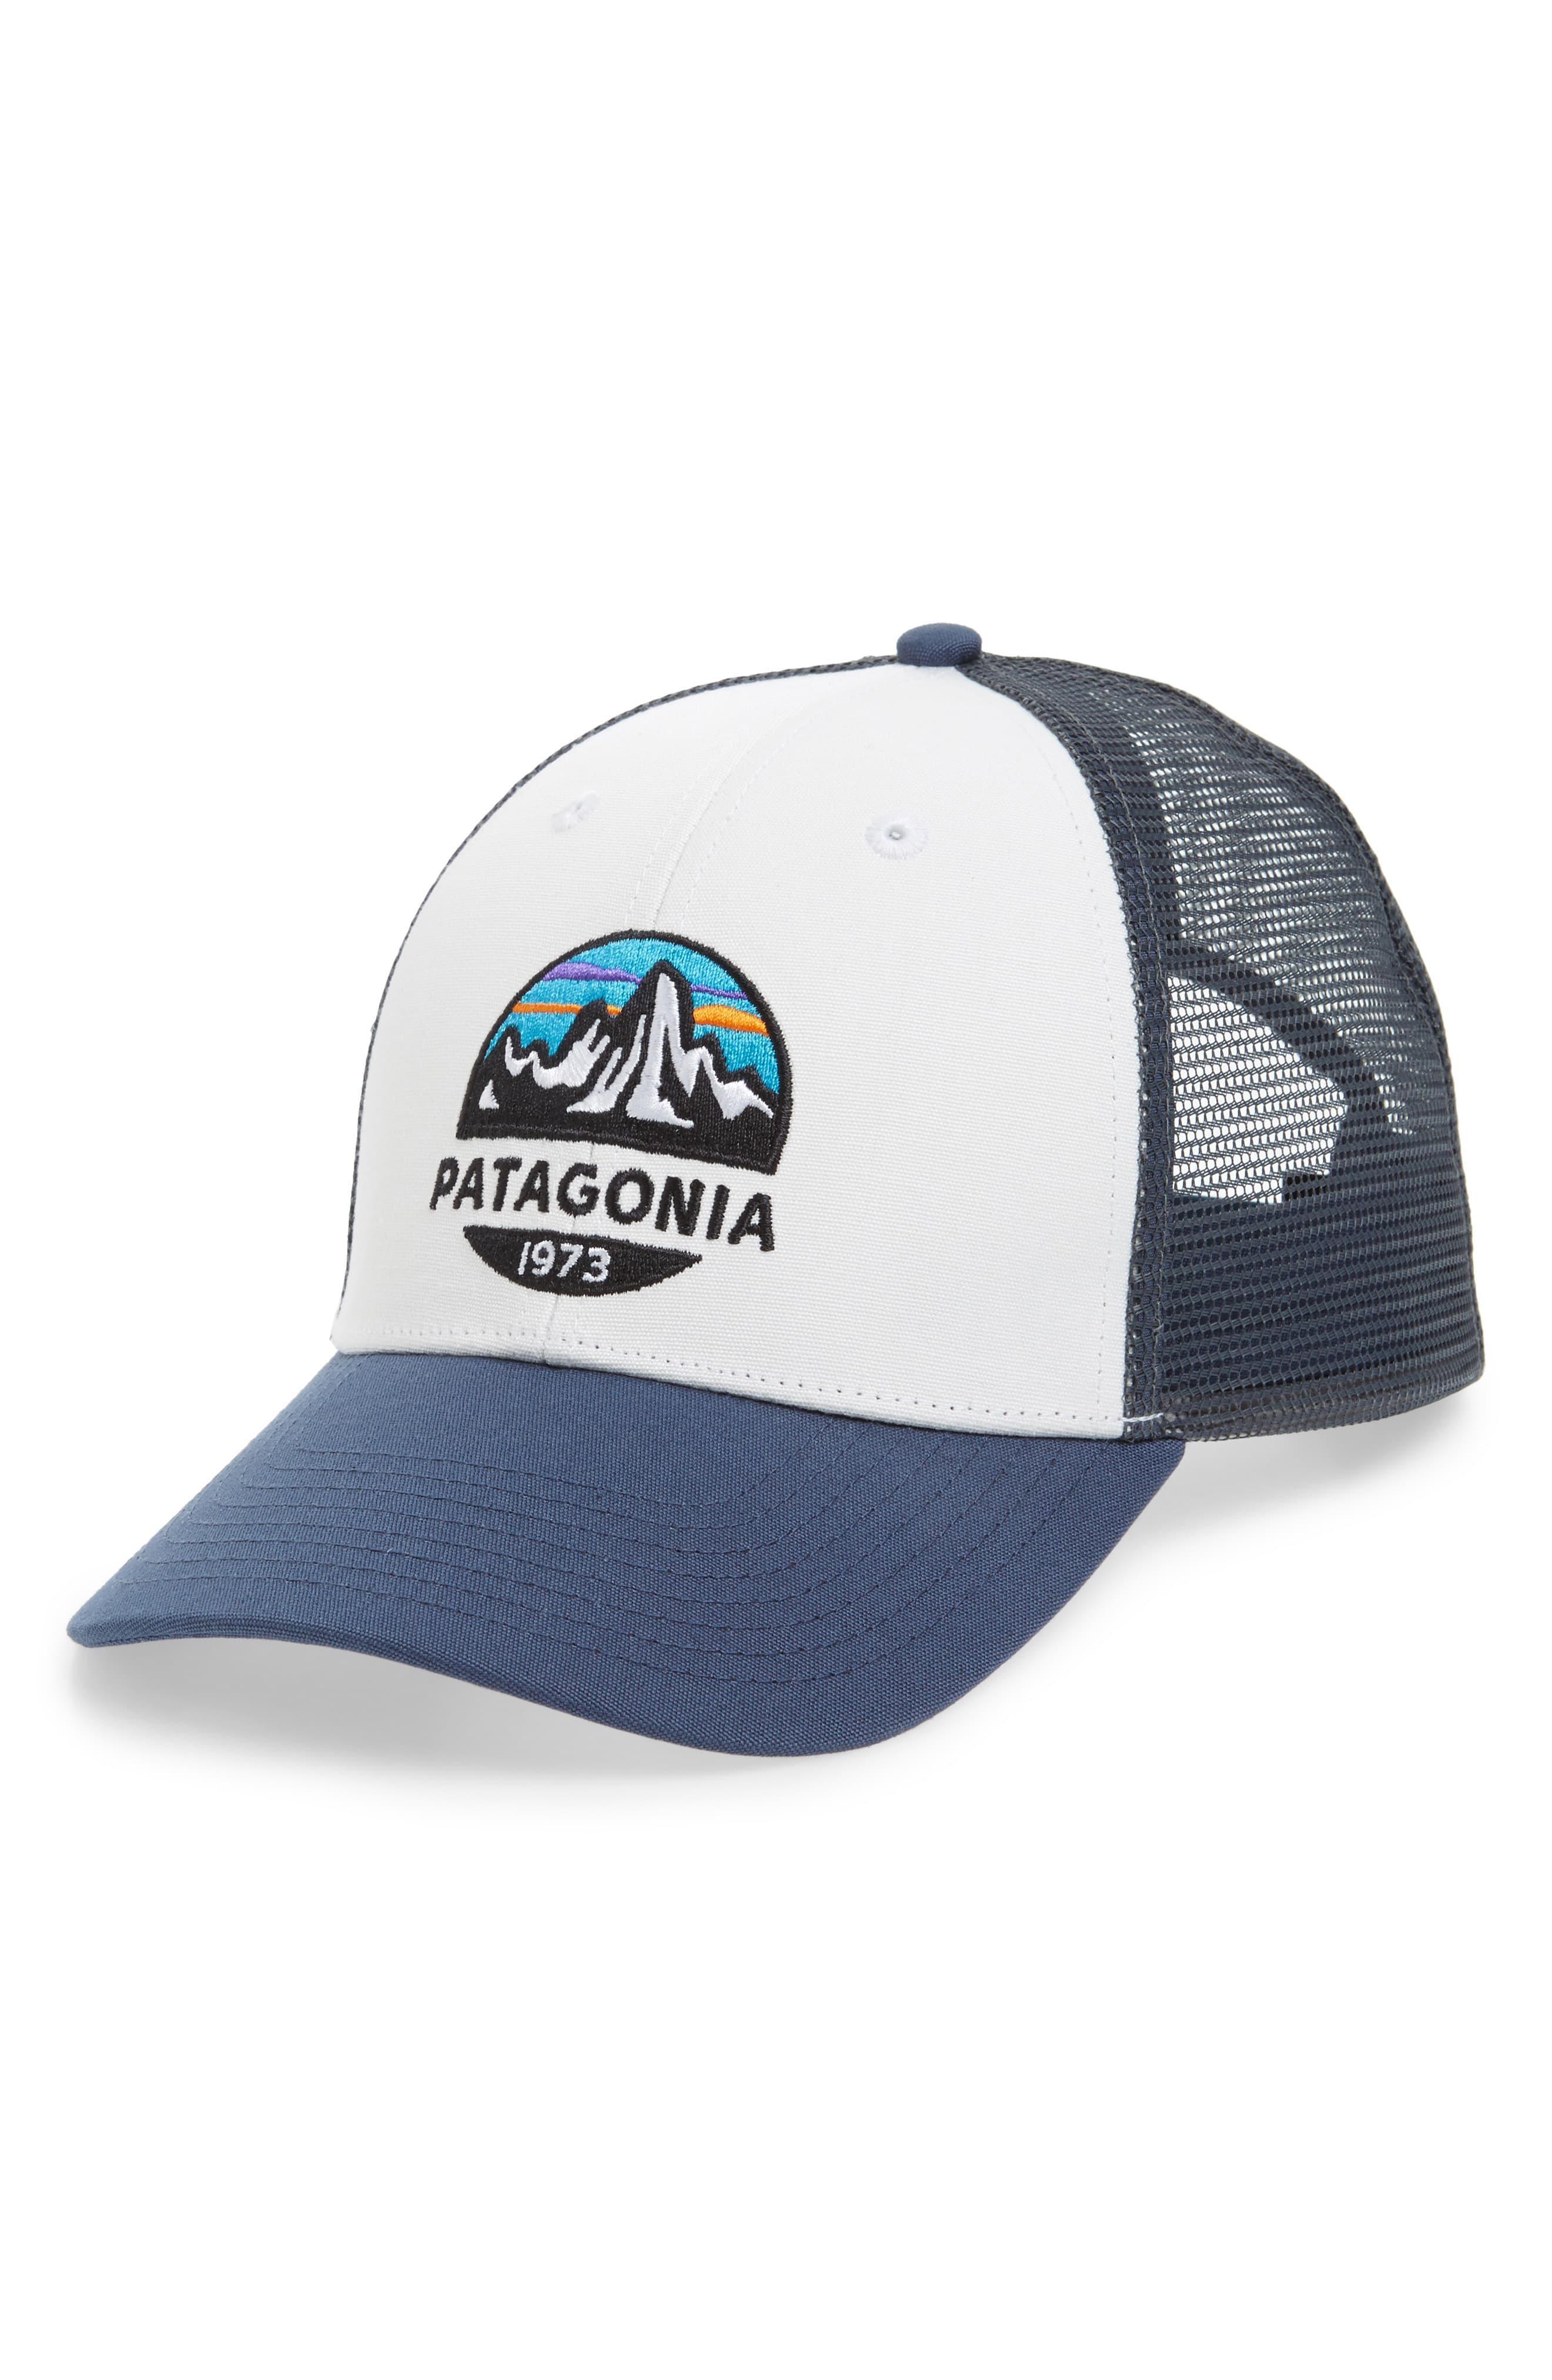 fdc15f6debaaf Lyst - Patagonia Fitz Roy Scope Lopro Trucker Cap in White for Men